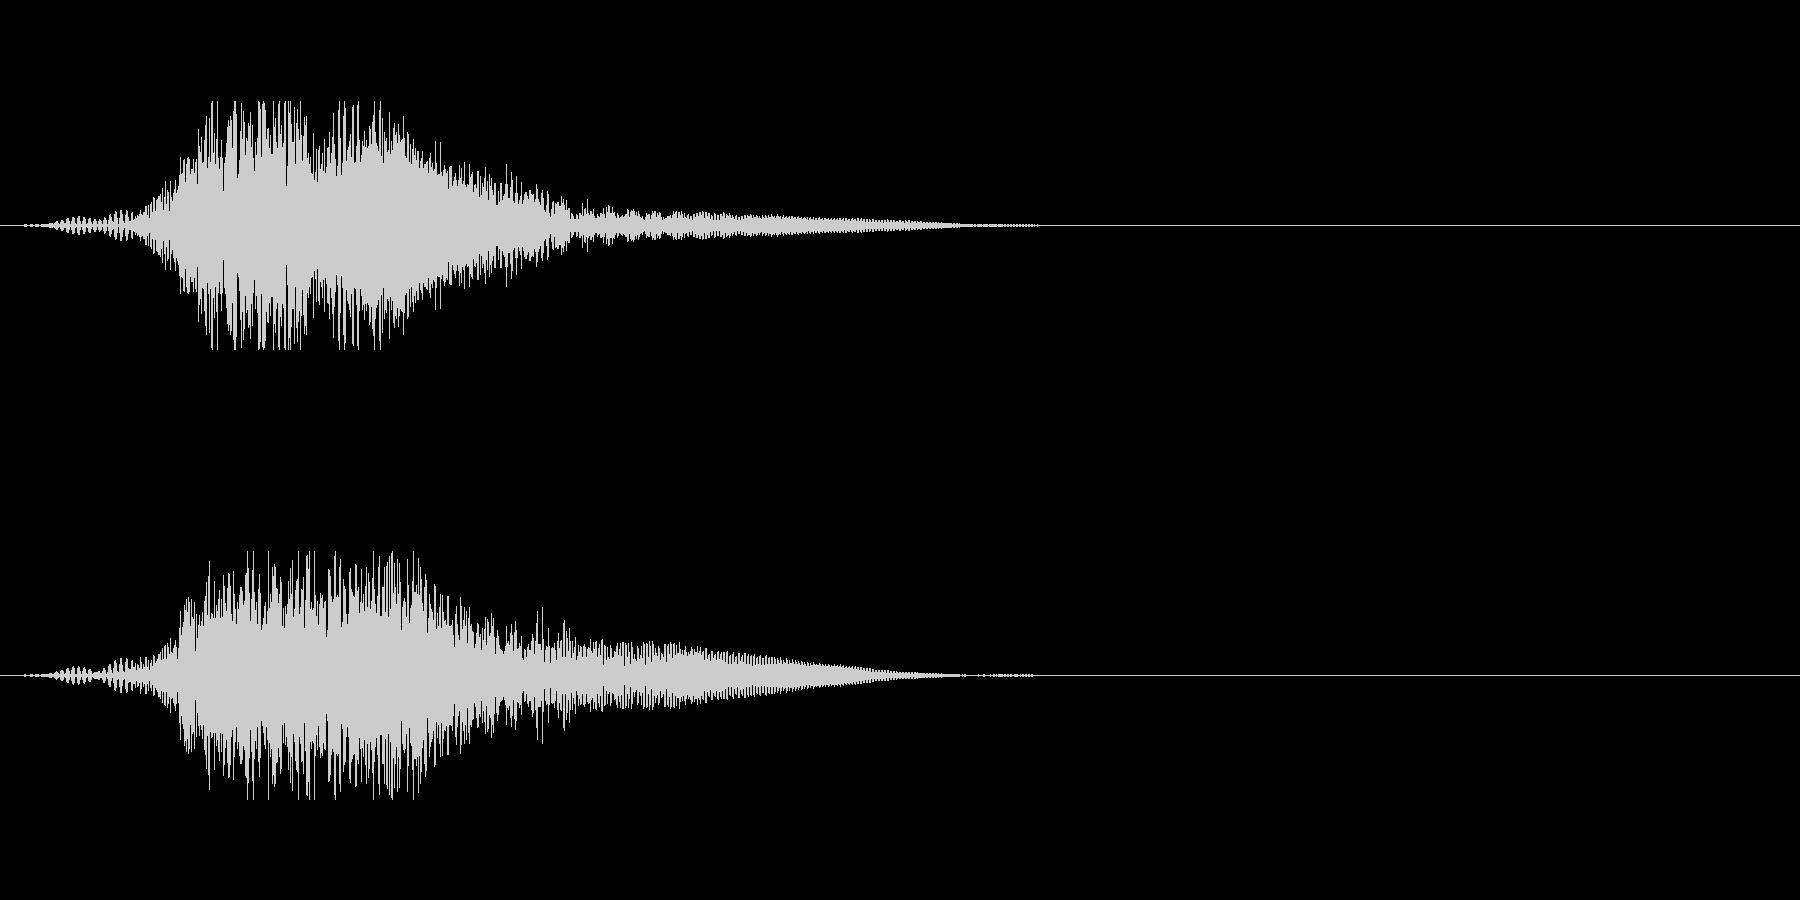 SFの開閉音や小規模ワープ風の未再生の波形